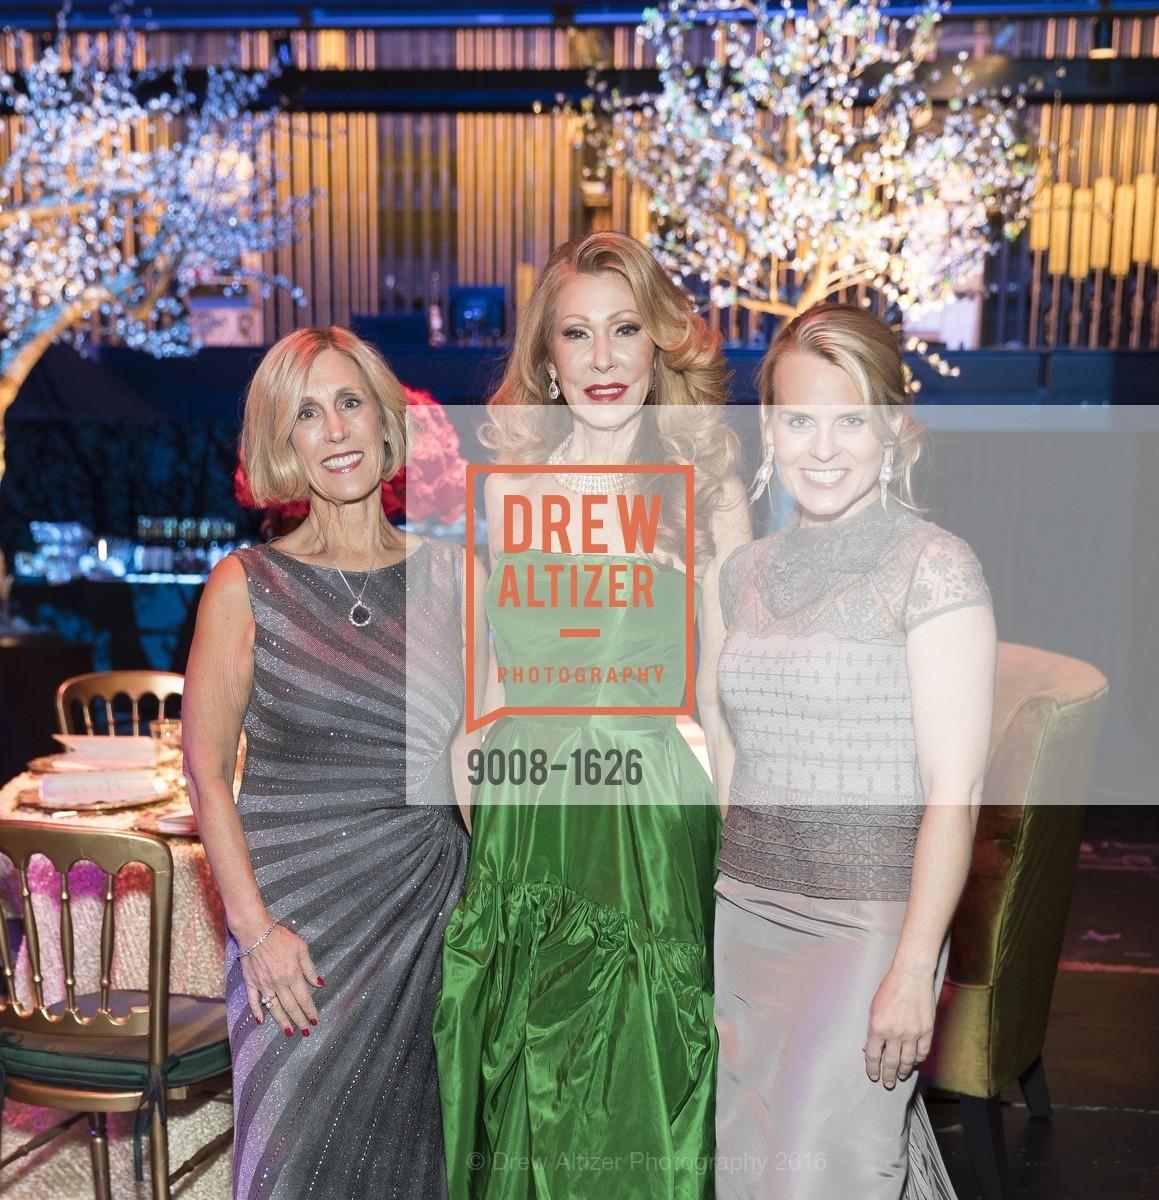 Kathy Huber, Teresa Medearis, Jane Mudge, Photo #9008-1626